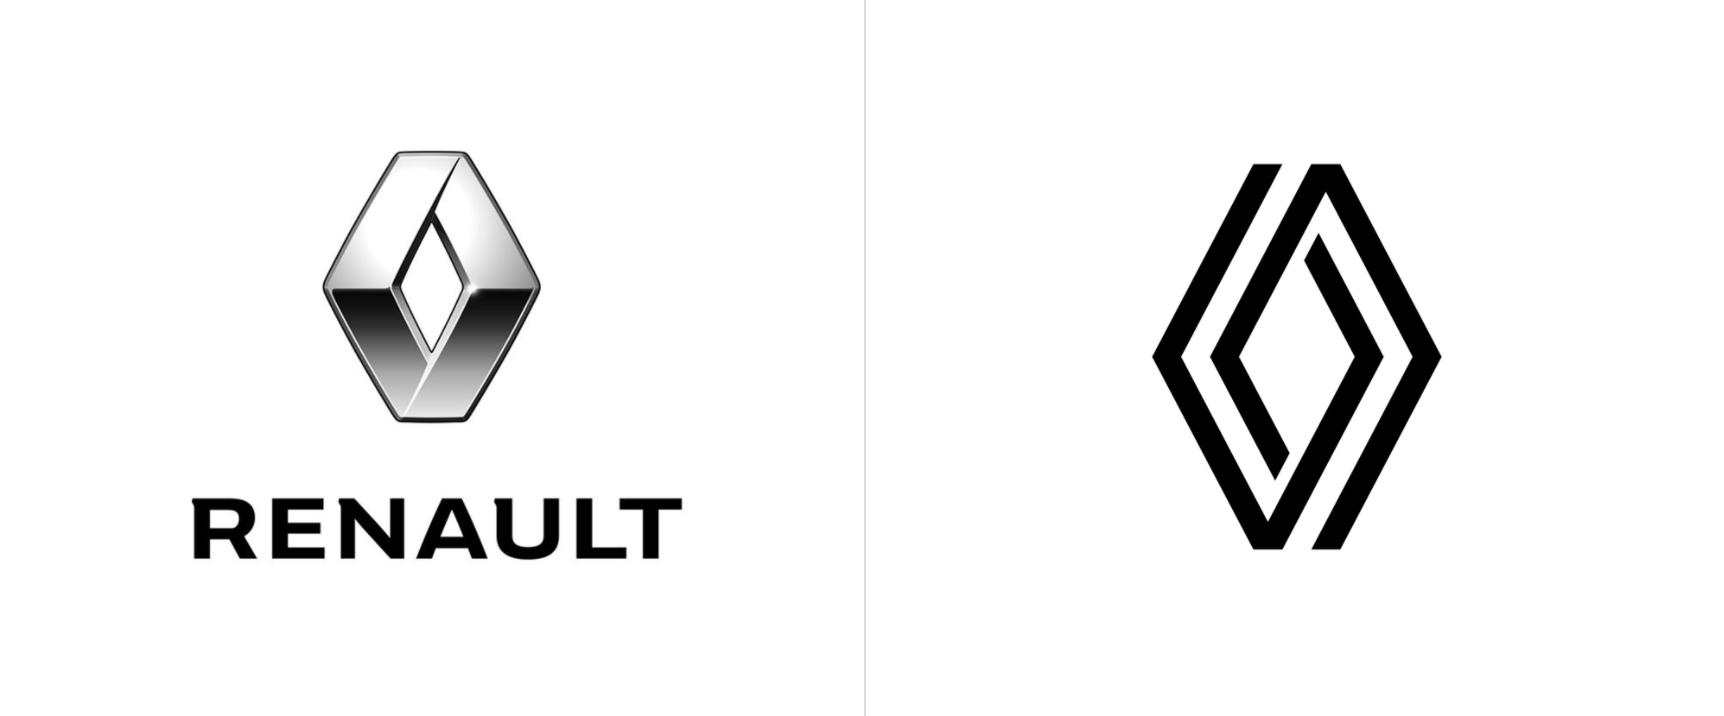 Auto brand trends: Renault logo